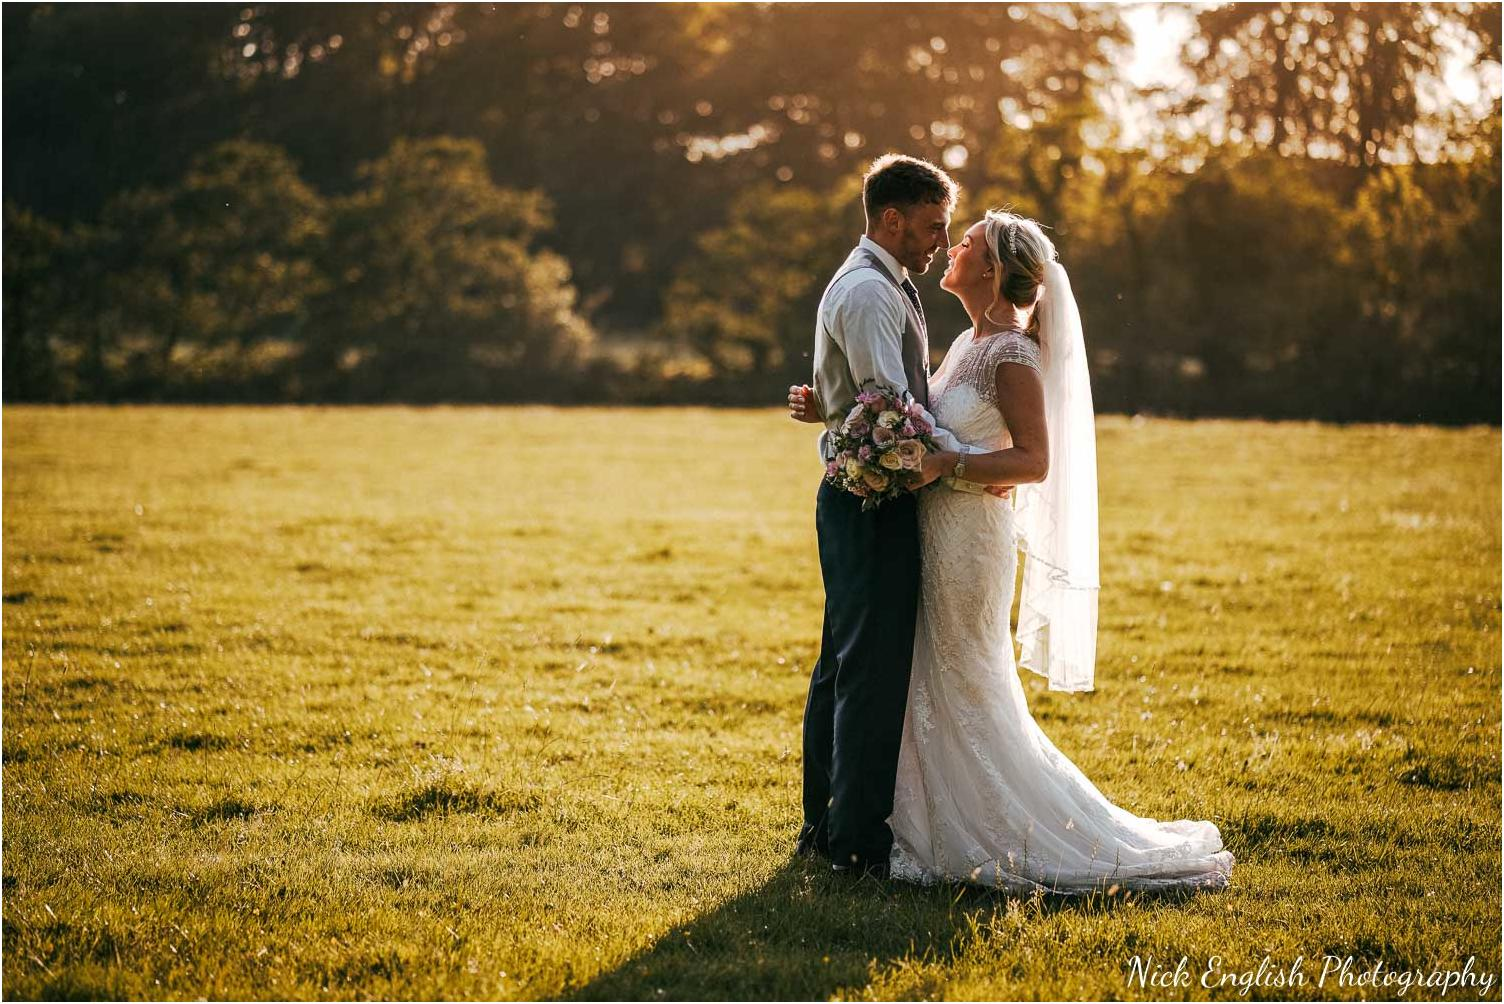 Mitton_Hall_Wedding_Photograph-174.jpg